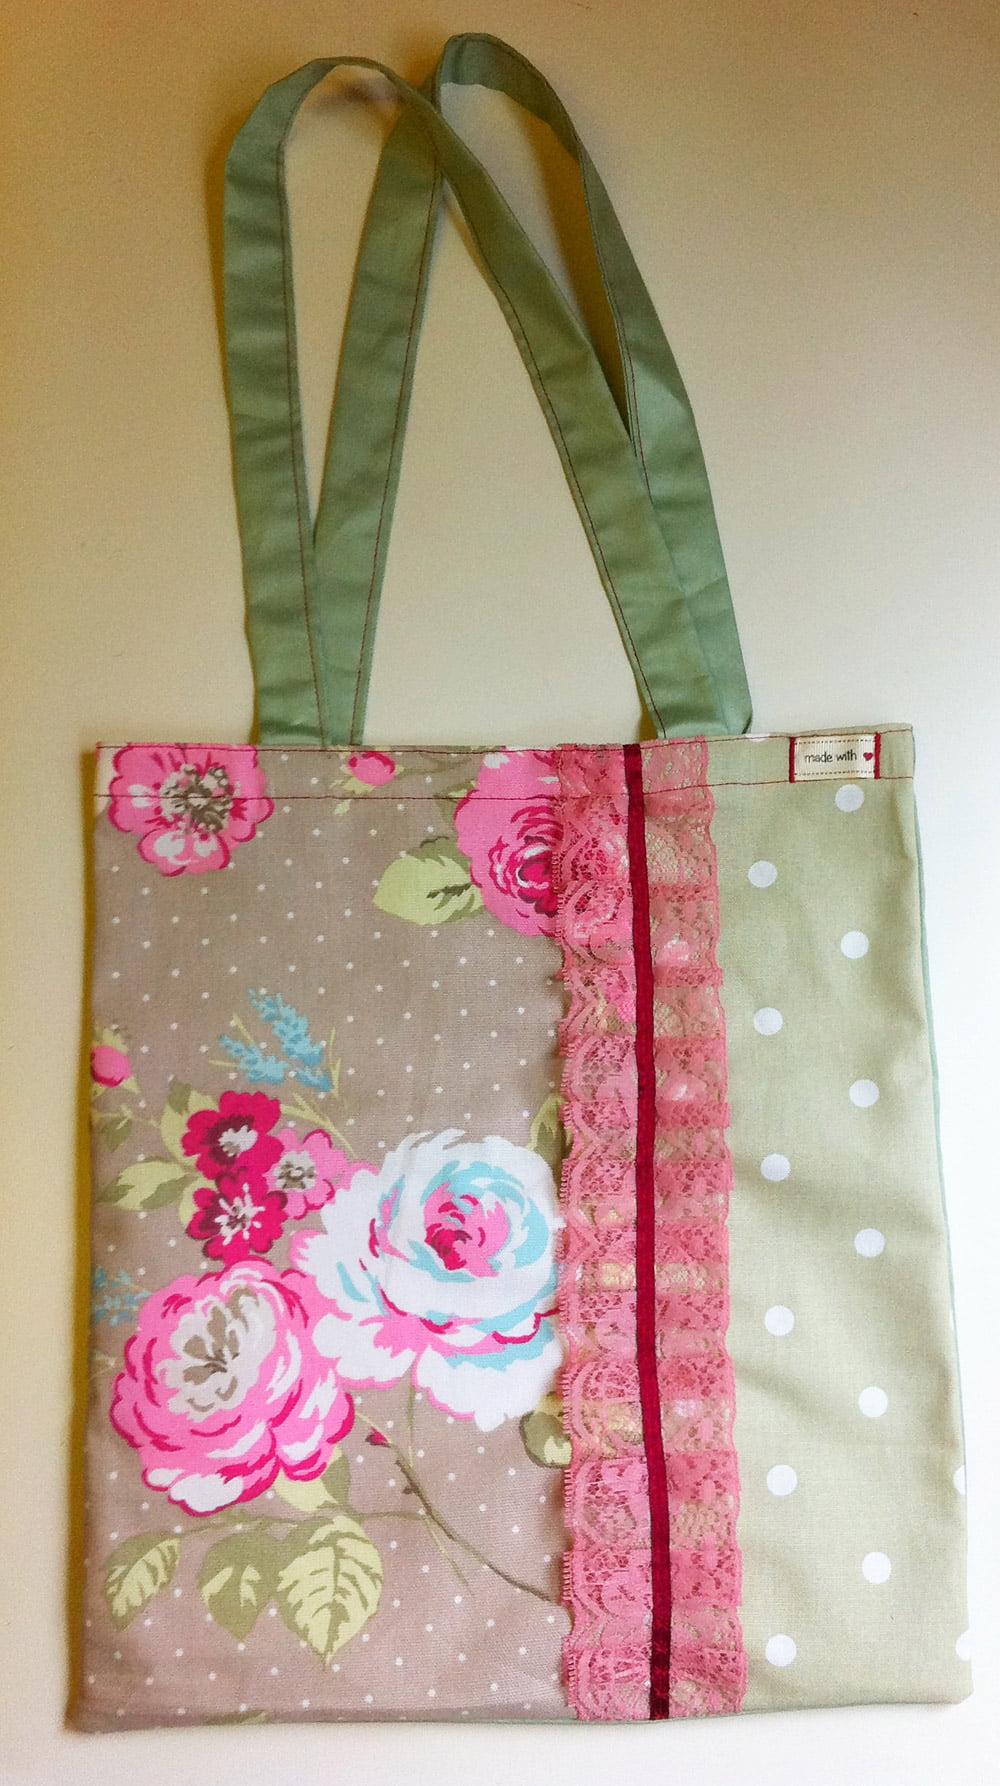 Tote Bag Workshop - All Sewn Up